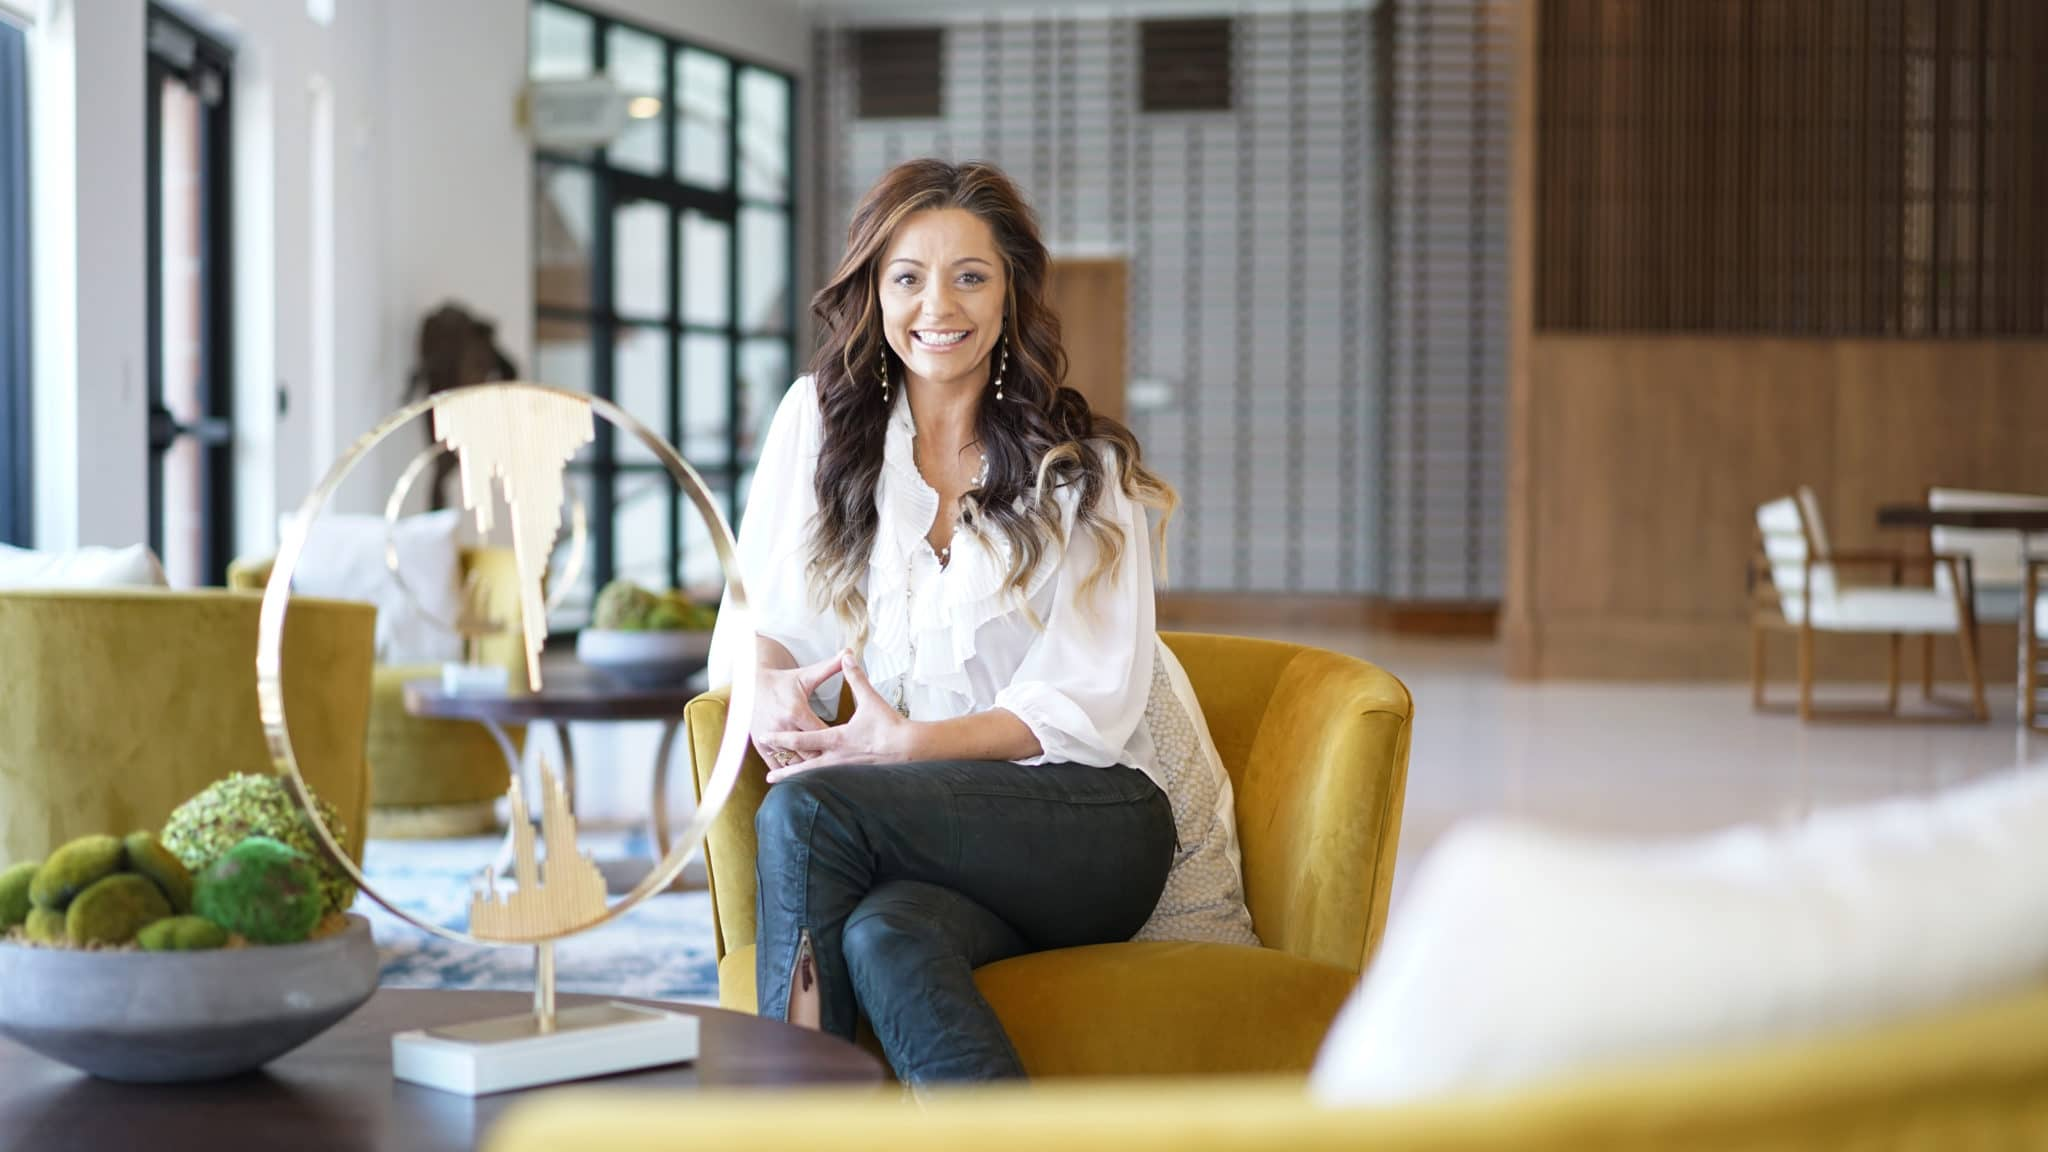 Angela Harris Stars in Season 2 of The Reveal on The Design Network